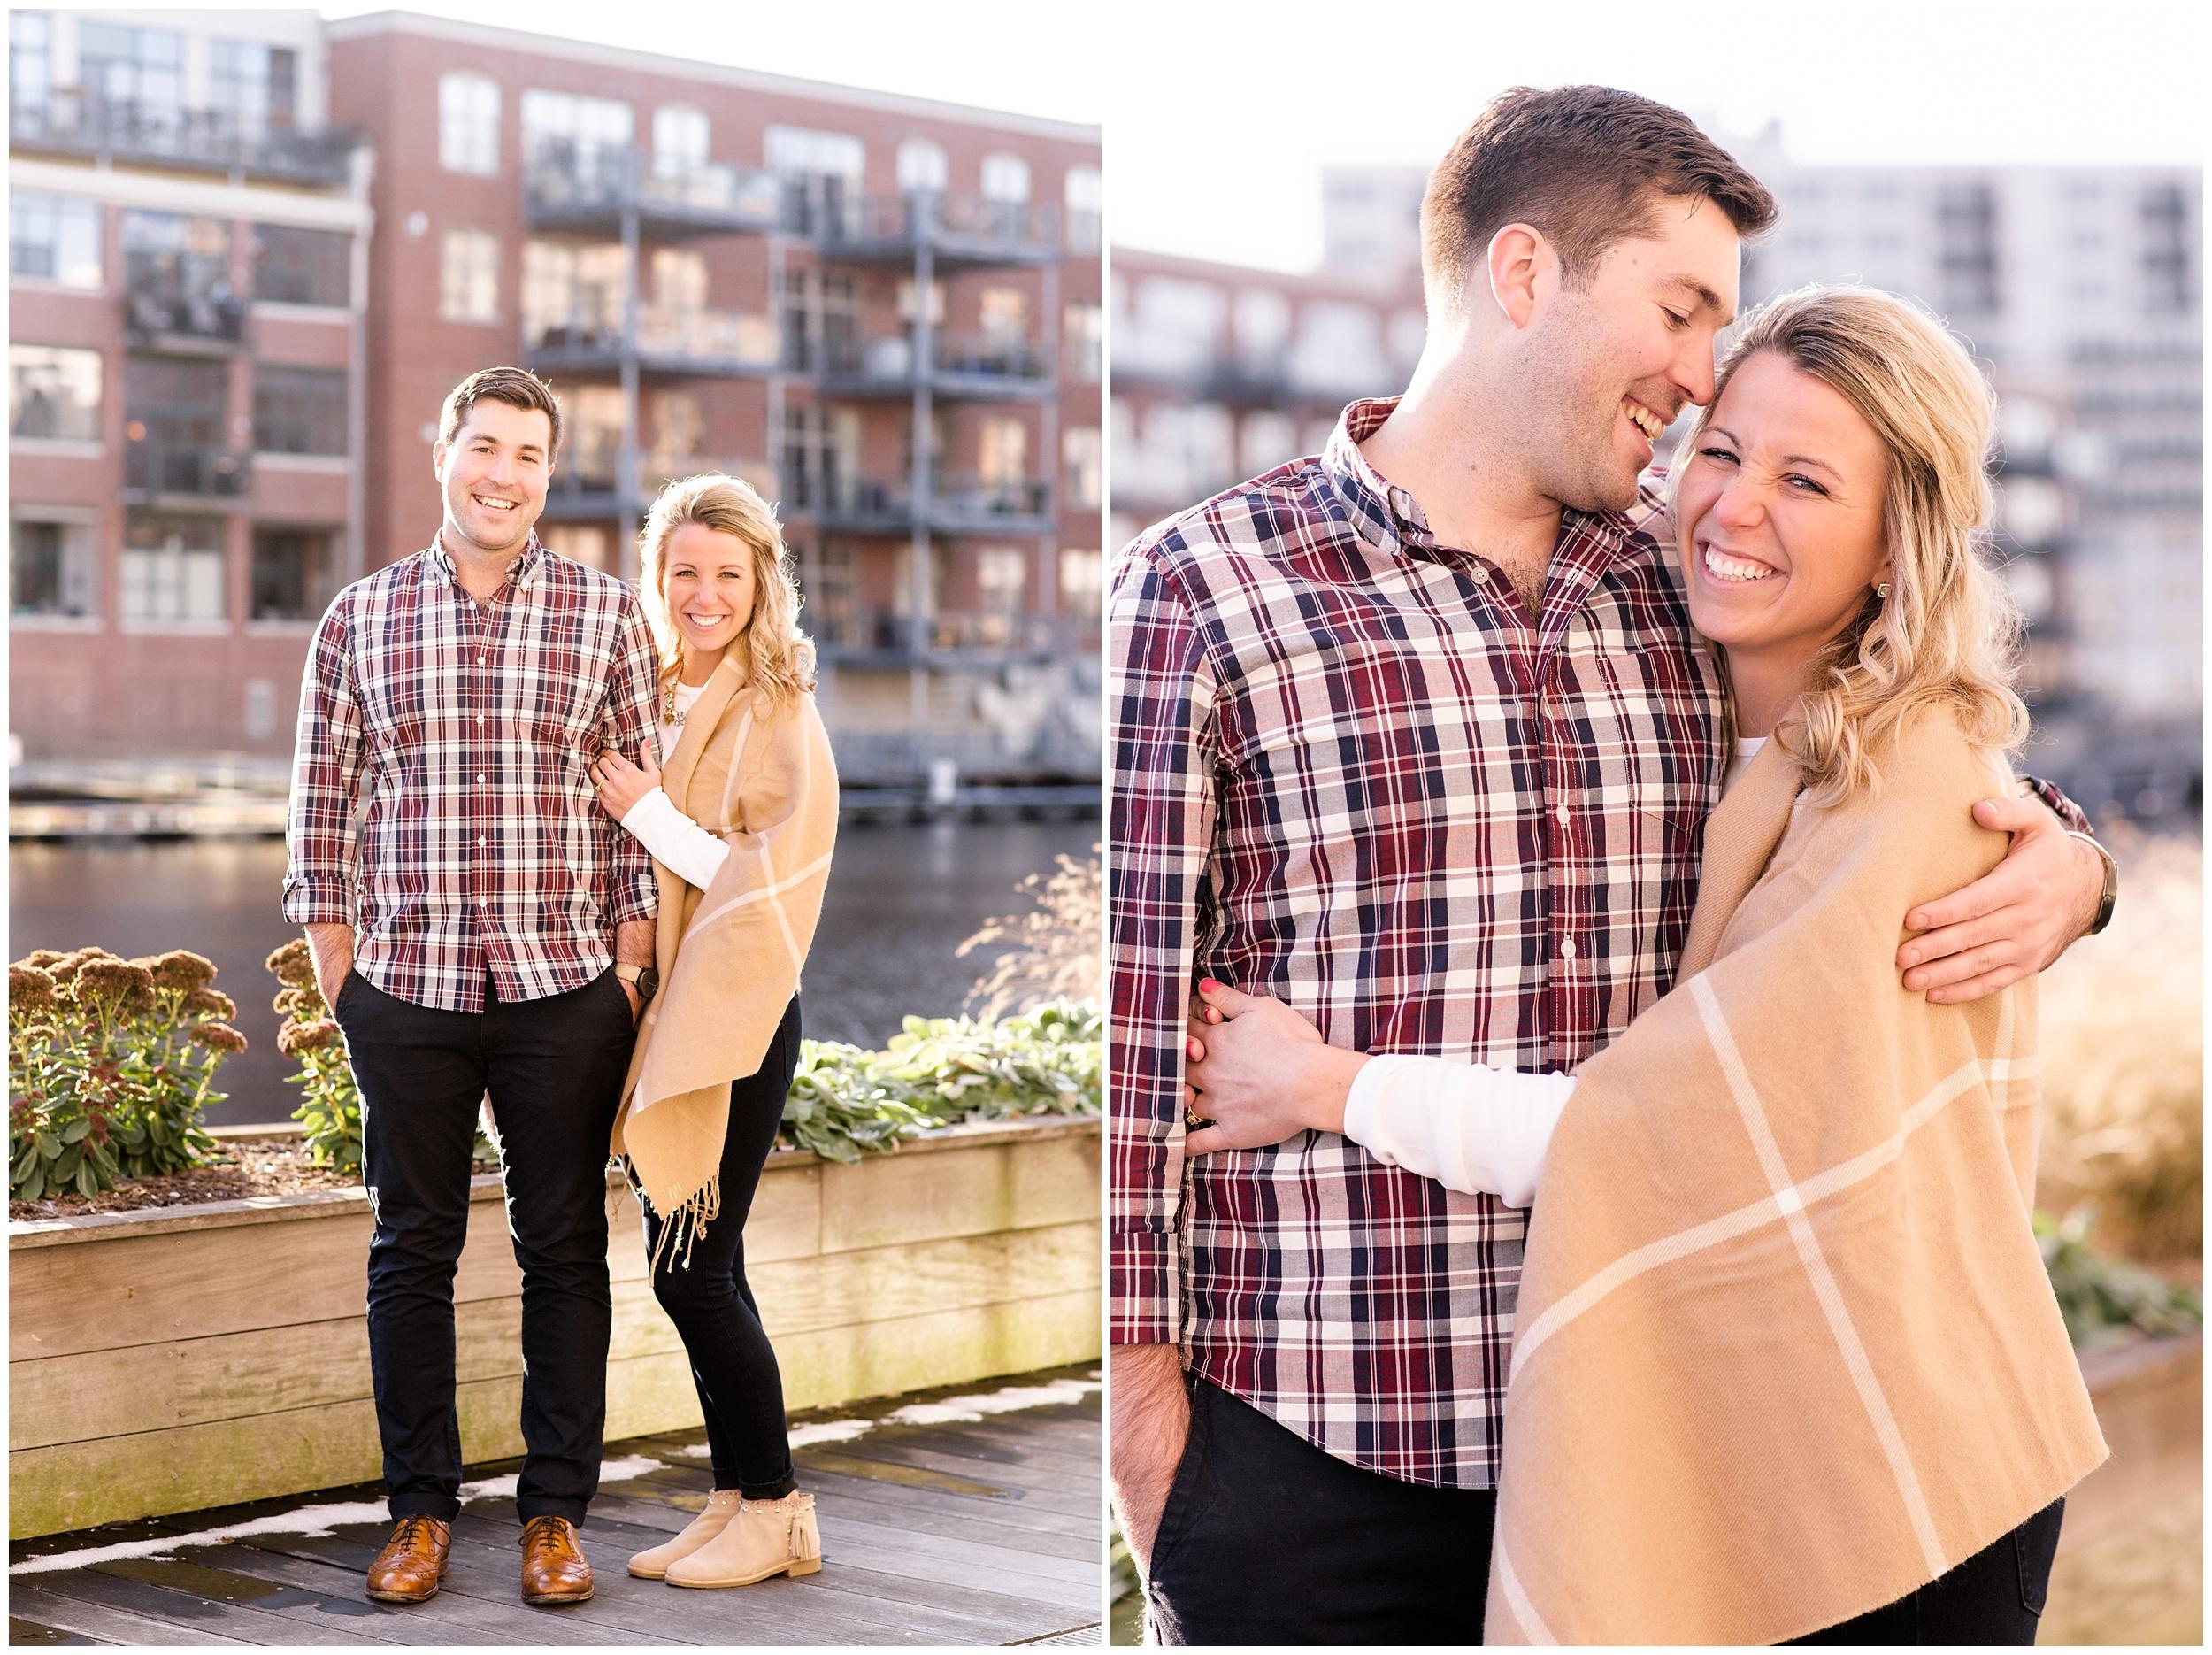 milwaukee-third-ward-riverfront-engagement-photography-session-wedding-photographer-_0002.jpg